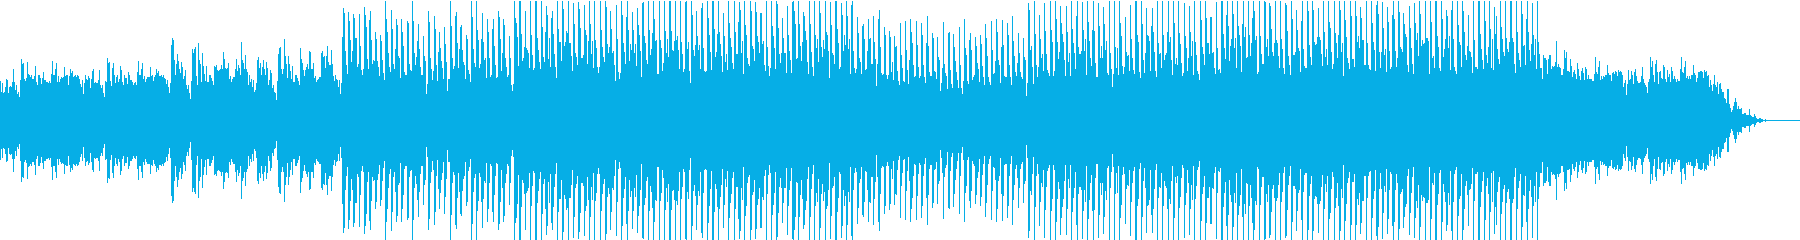 EDMメカニカル、テクノ、クラブ系-01の再生済みの波形